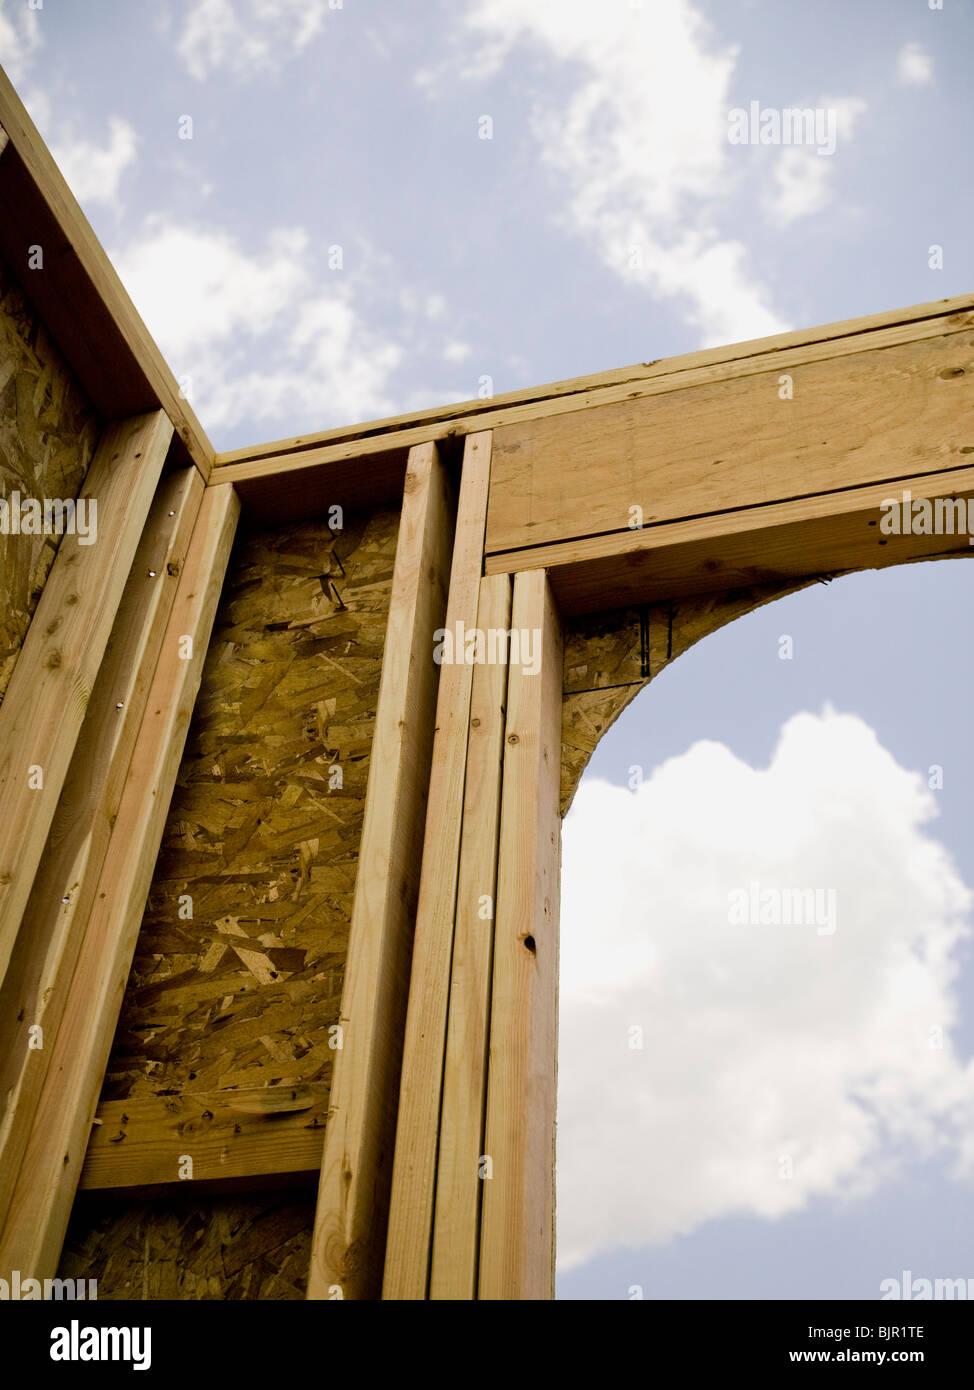 Construction job site. - Stock Image